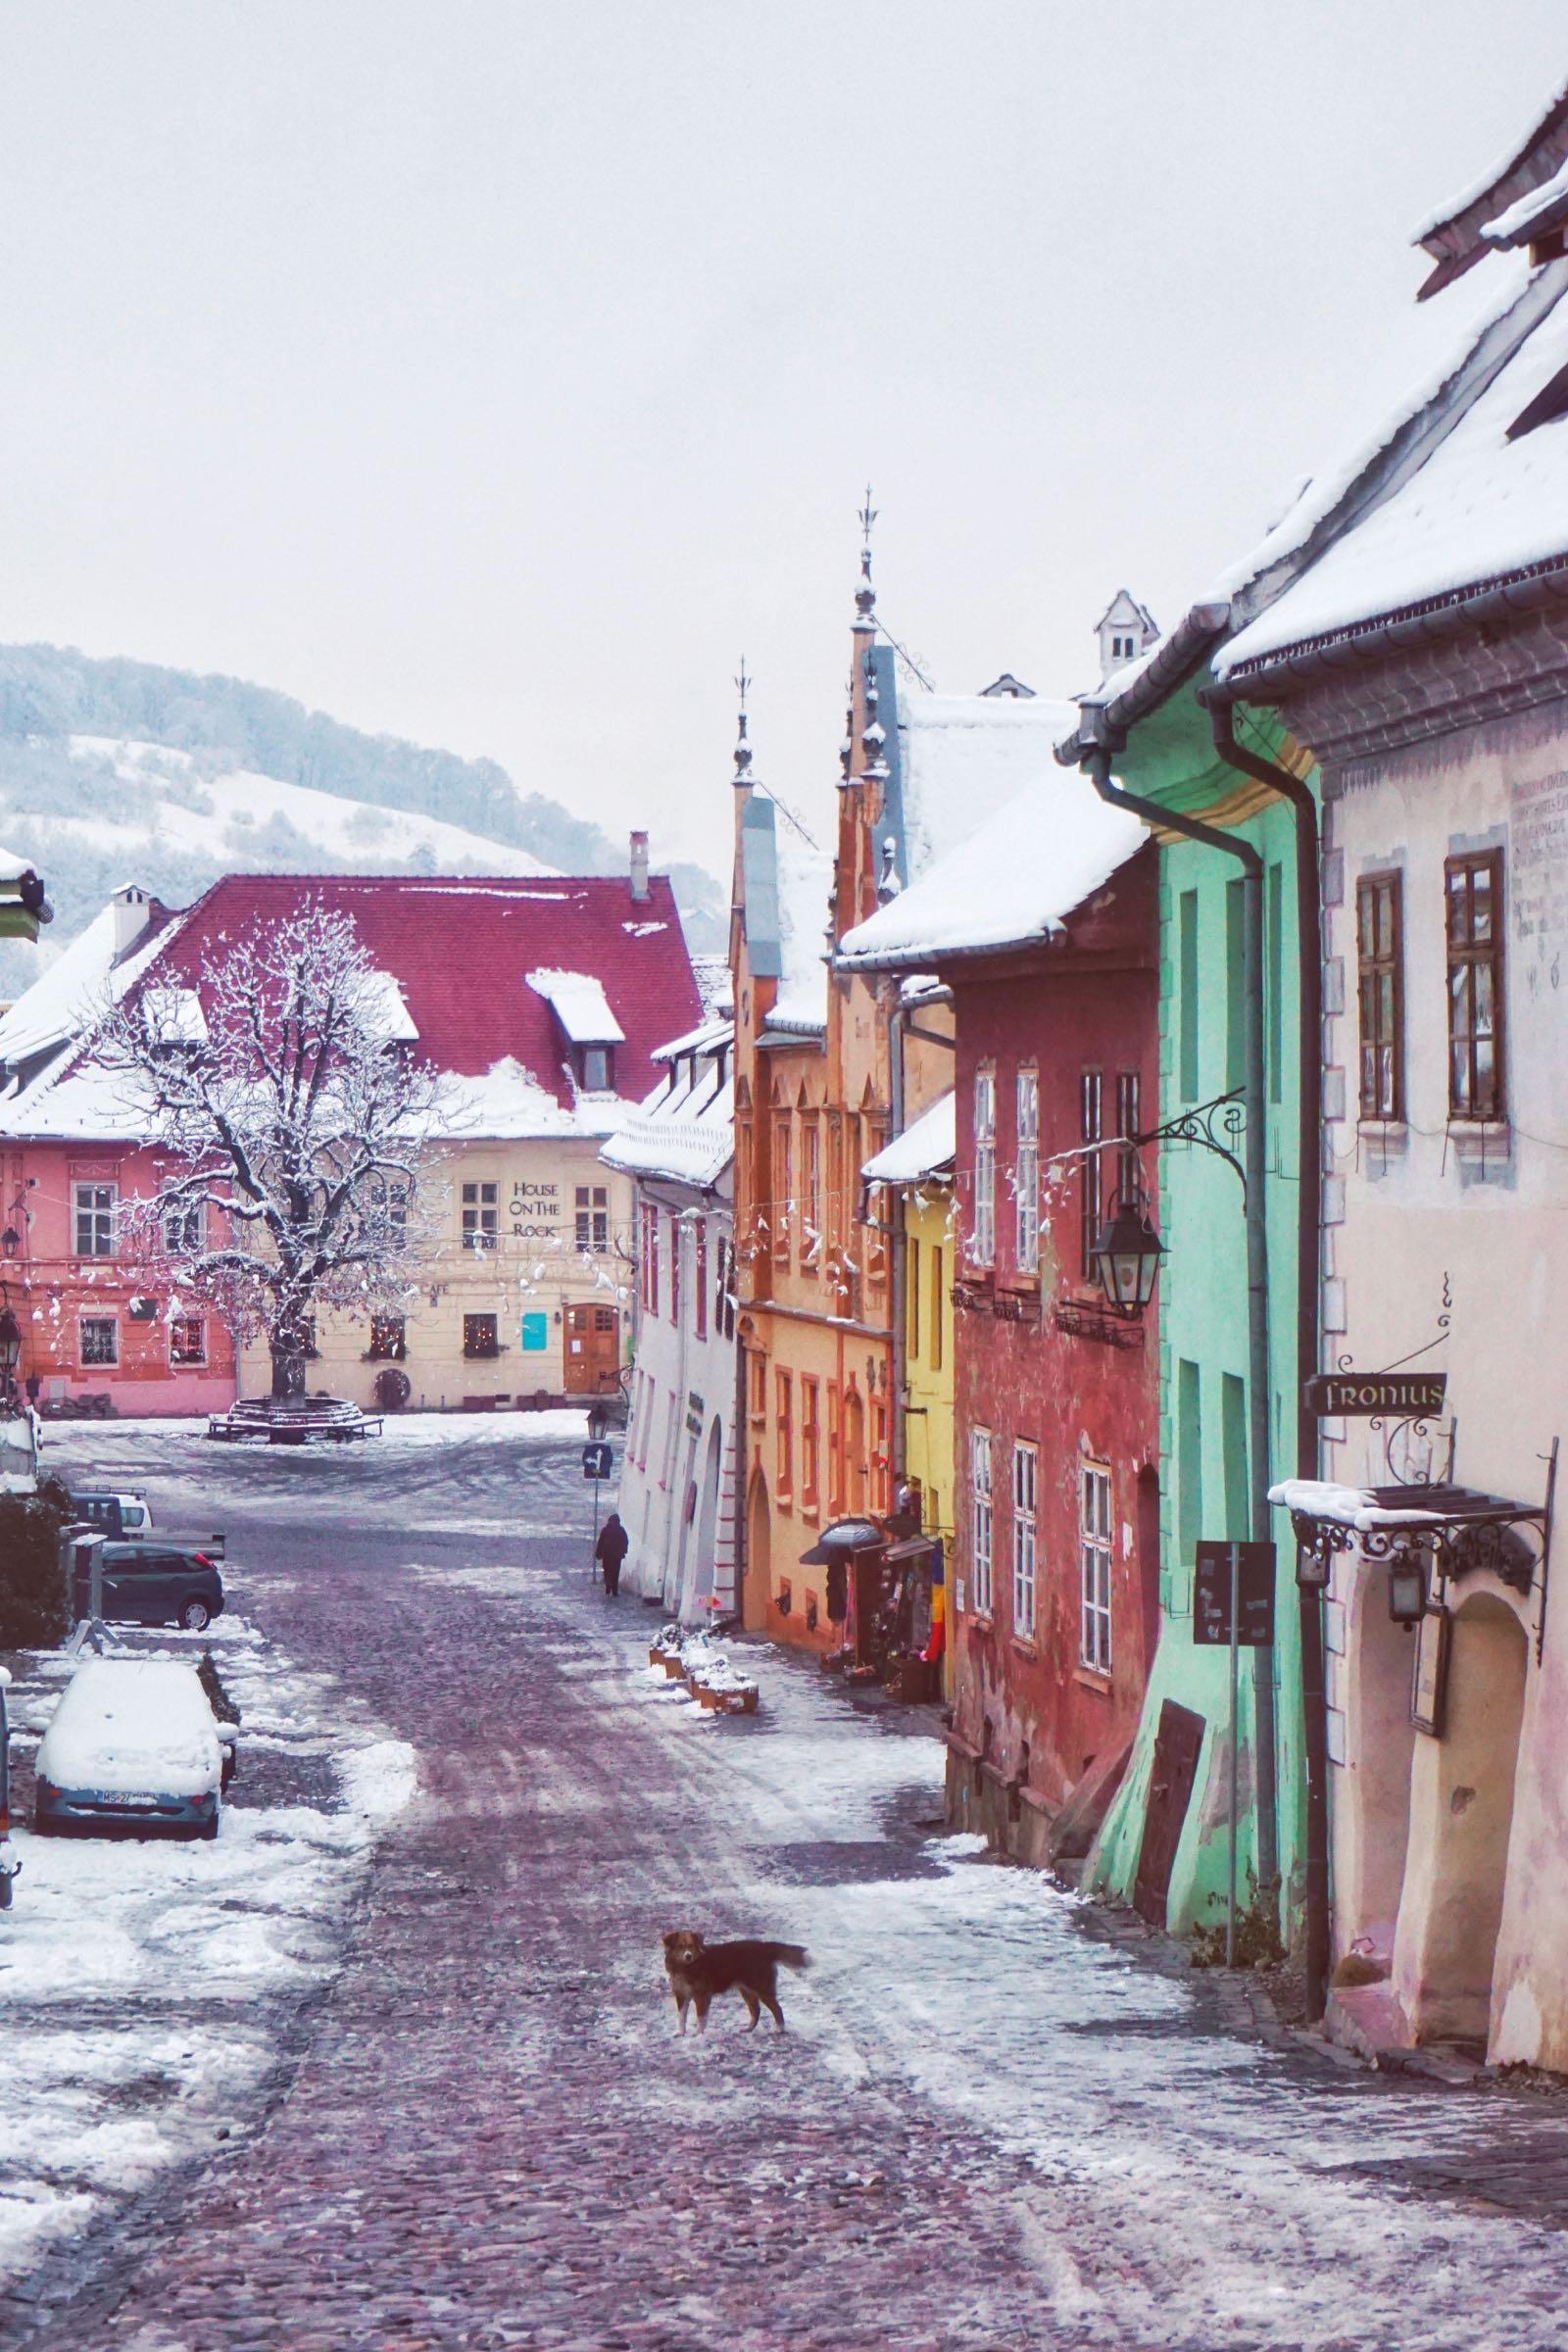 Icy Cobblestone Road In Balkans